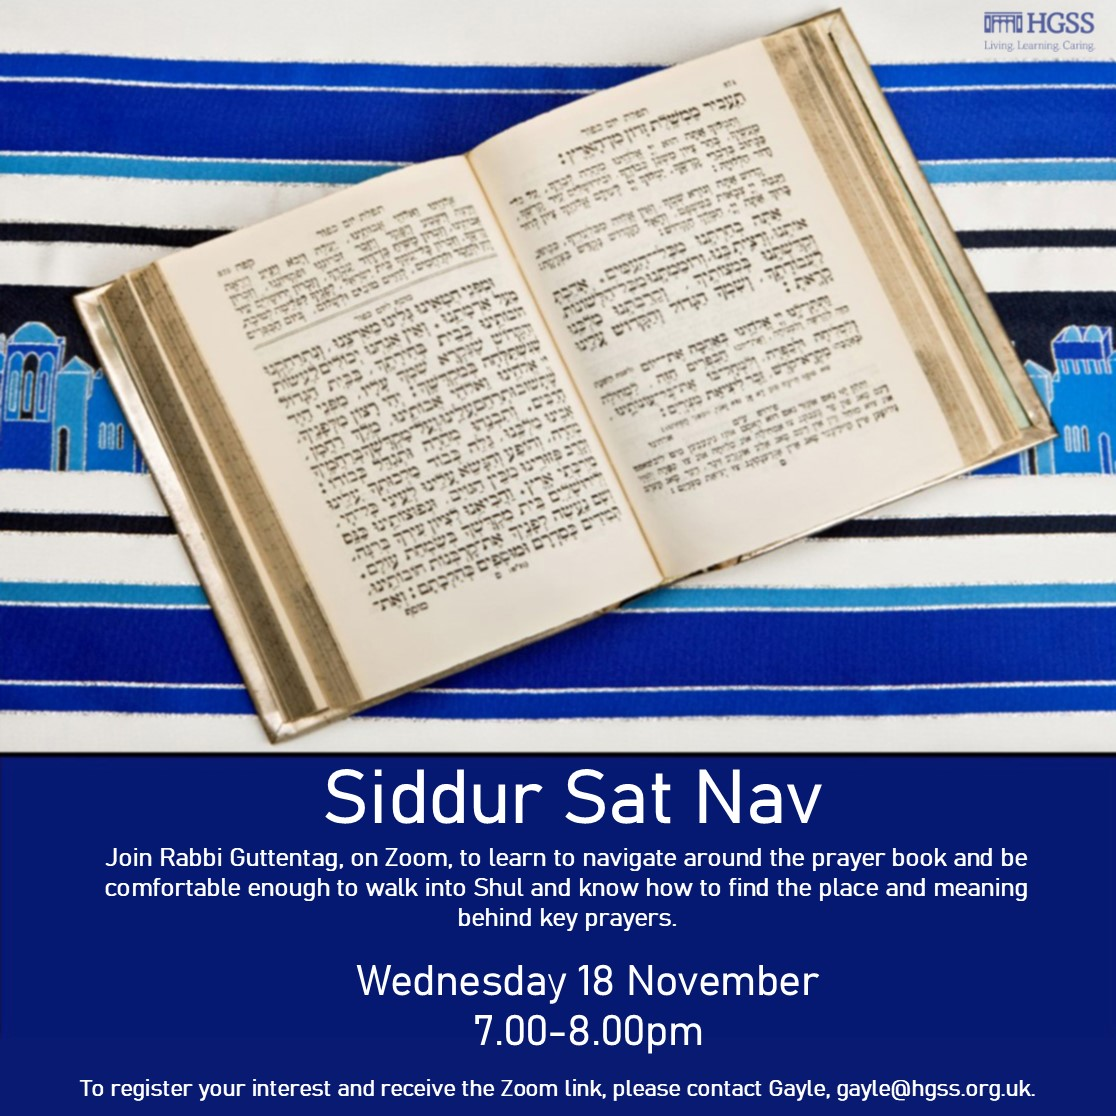 Siddur Sat Nav @ Online (Contact Gayle for link)